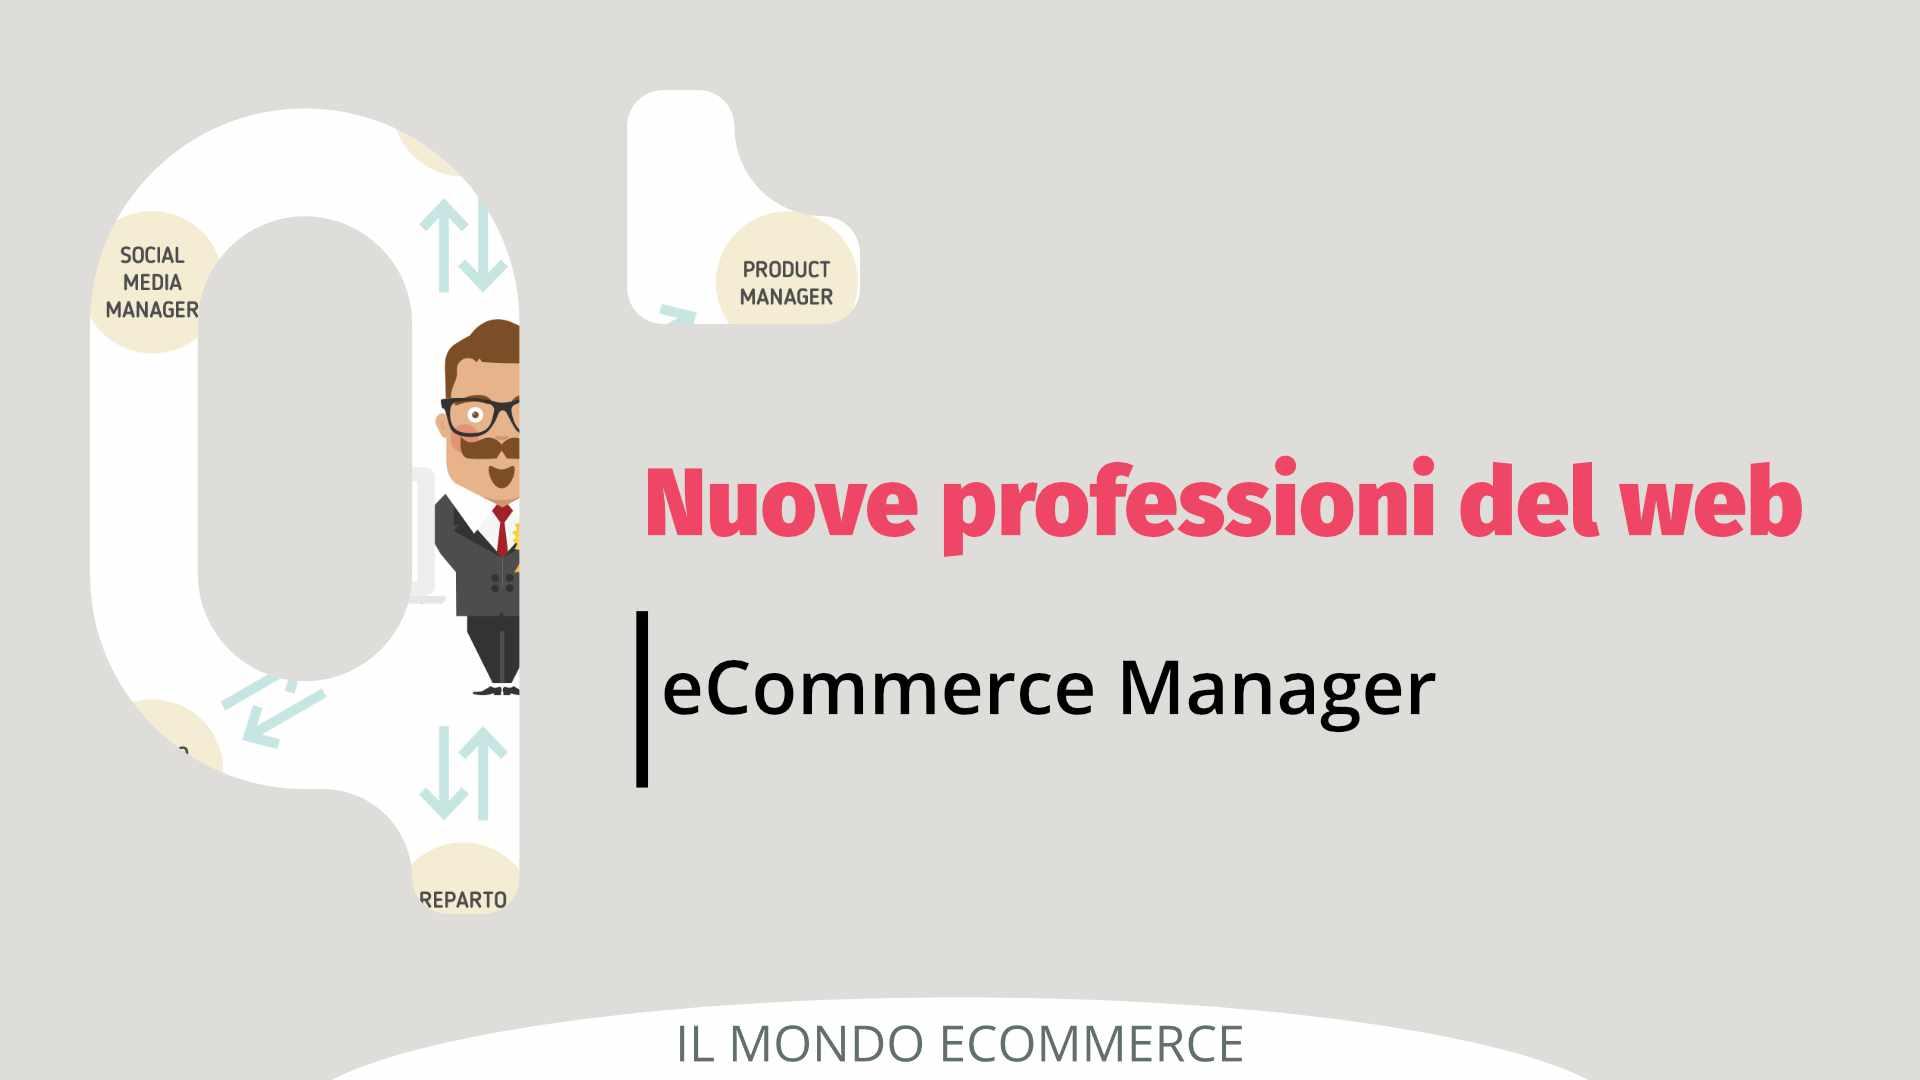 Nuove professioni del web: eCommerce Manager